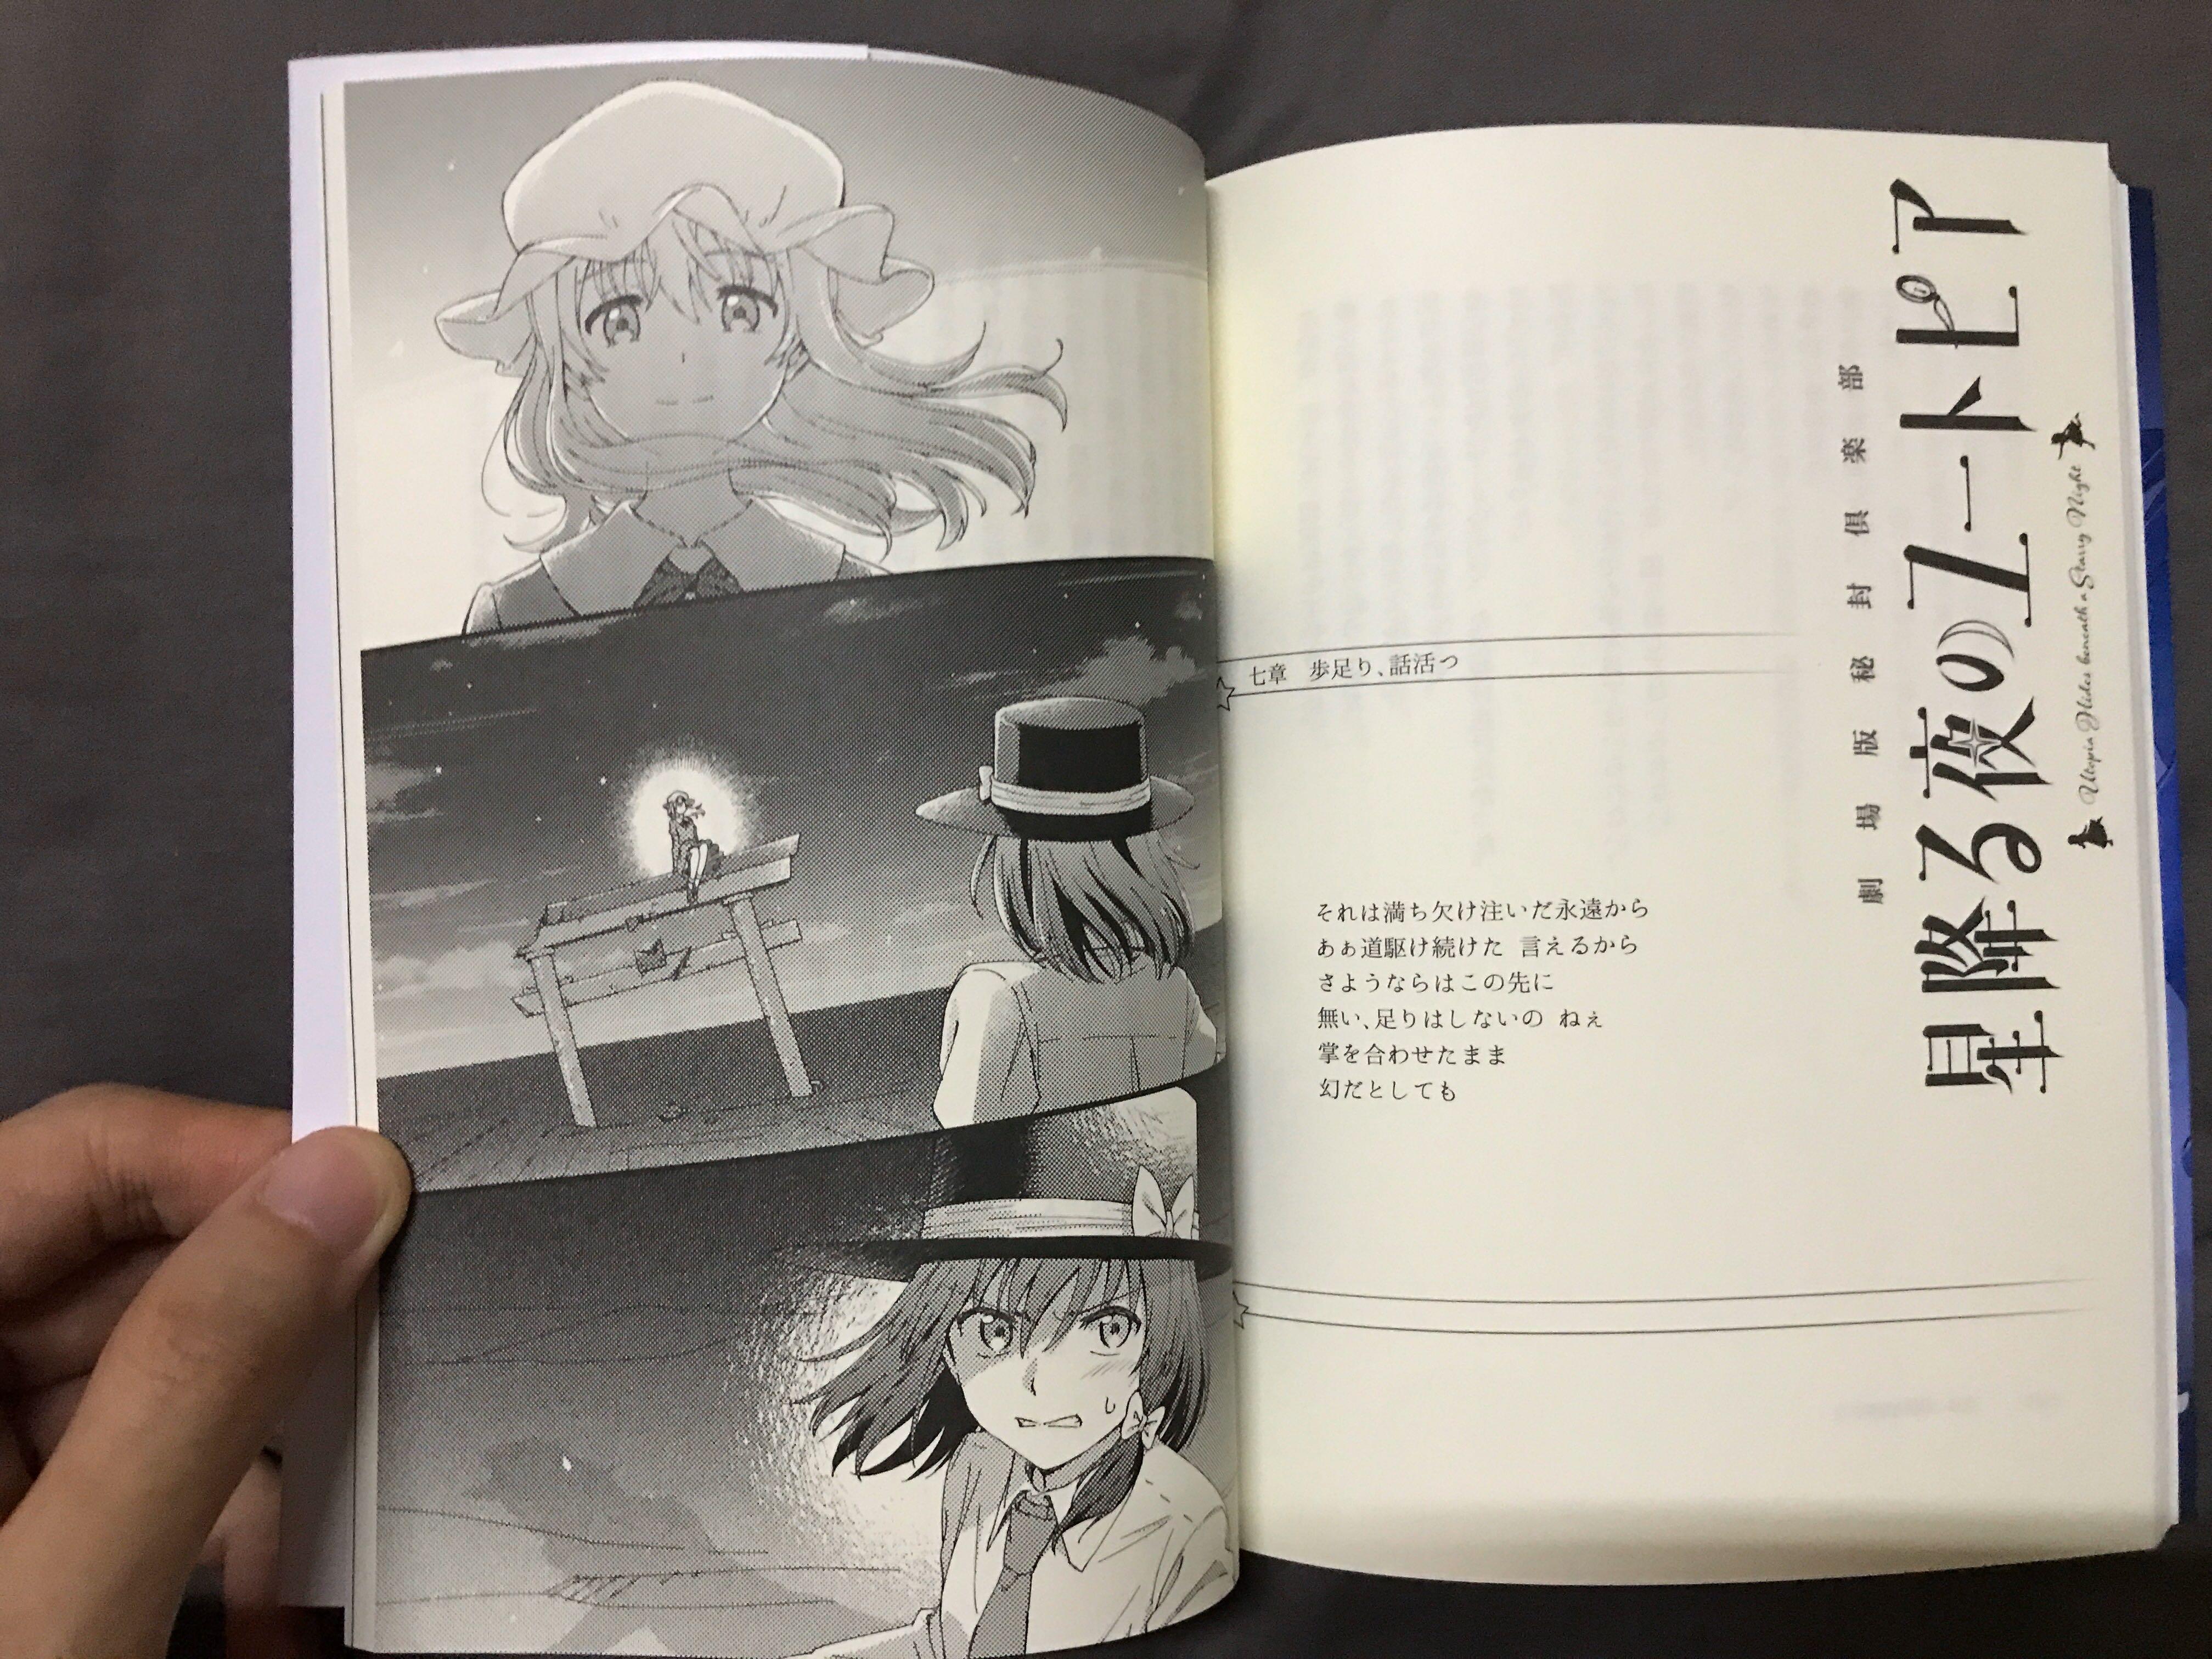 [Touhou Project] TUMENECO - 星降る夜のユートピア, Like New Condition